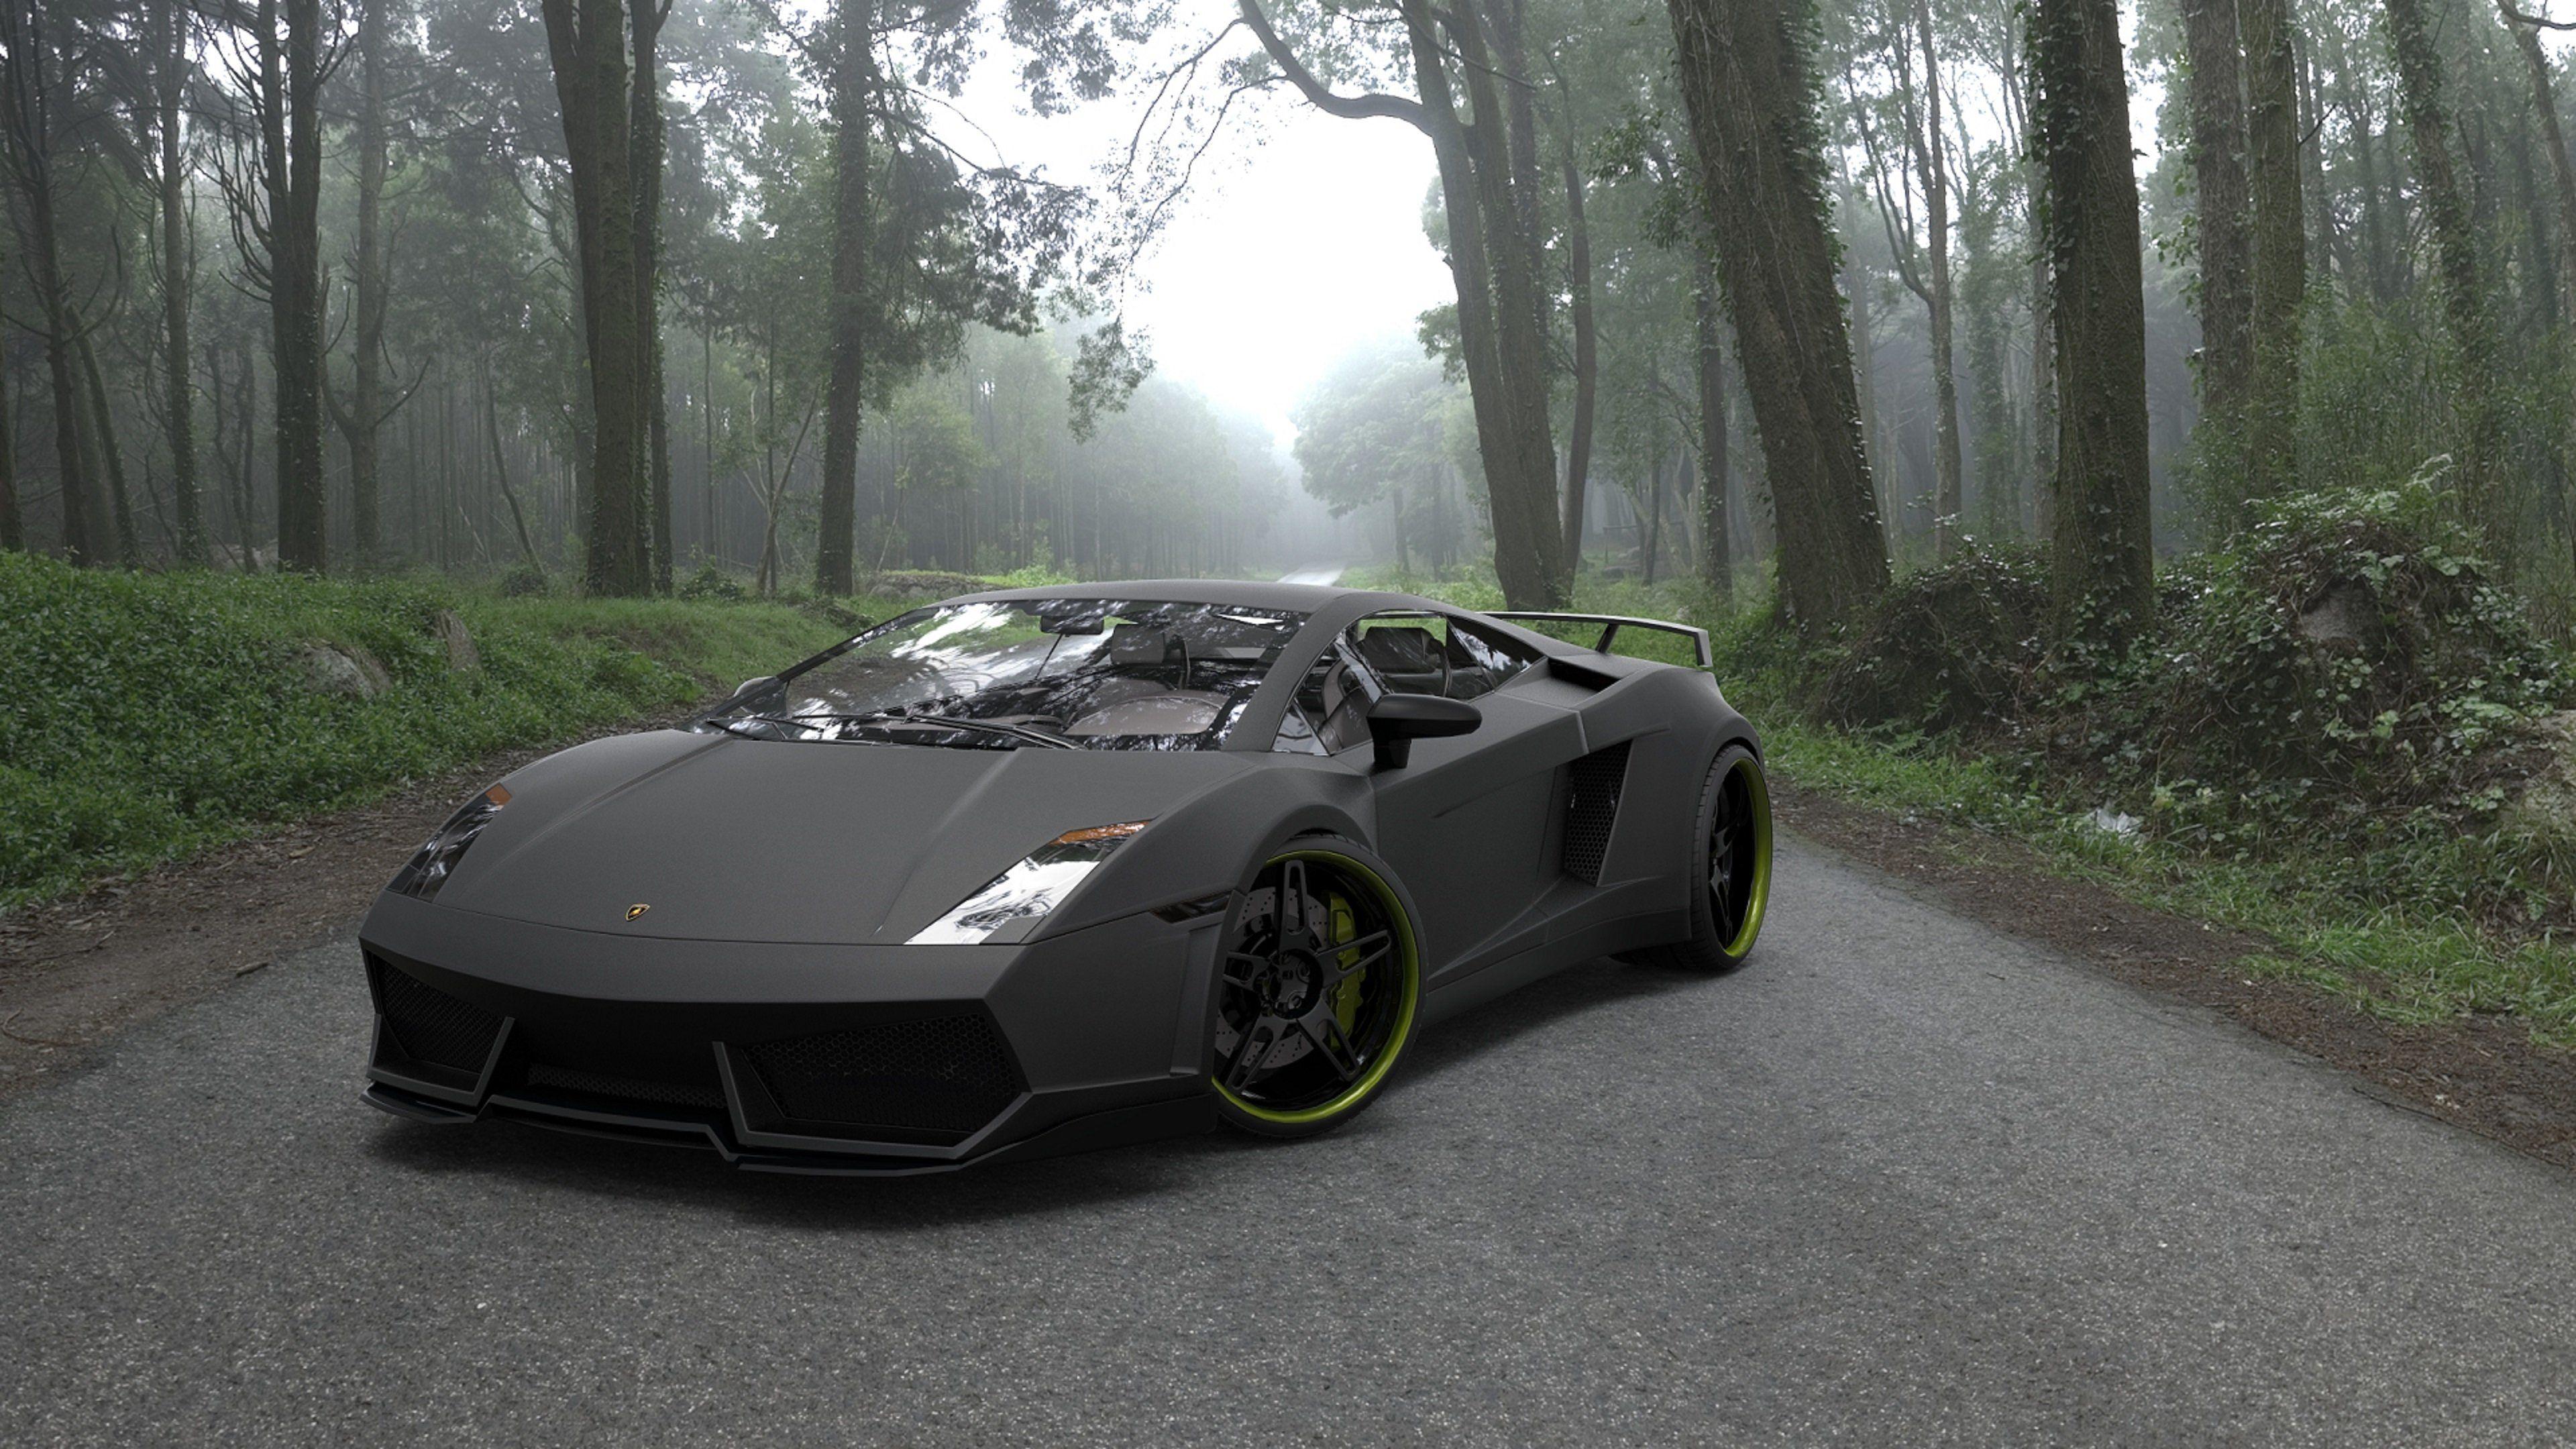 Black Ferrari Wallpaper 2dB Cars Pinterest Wallpaper